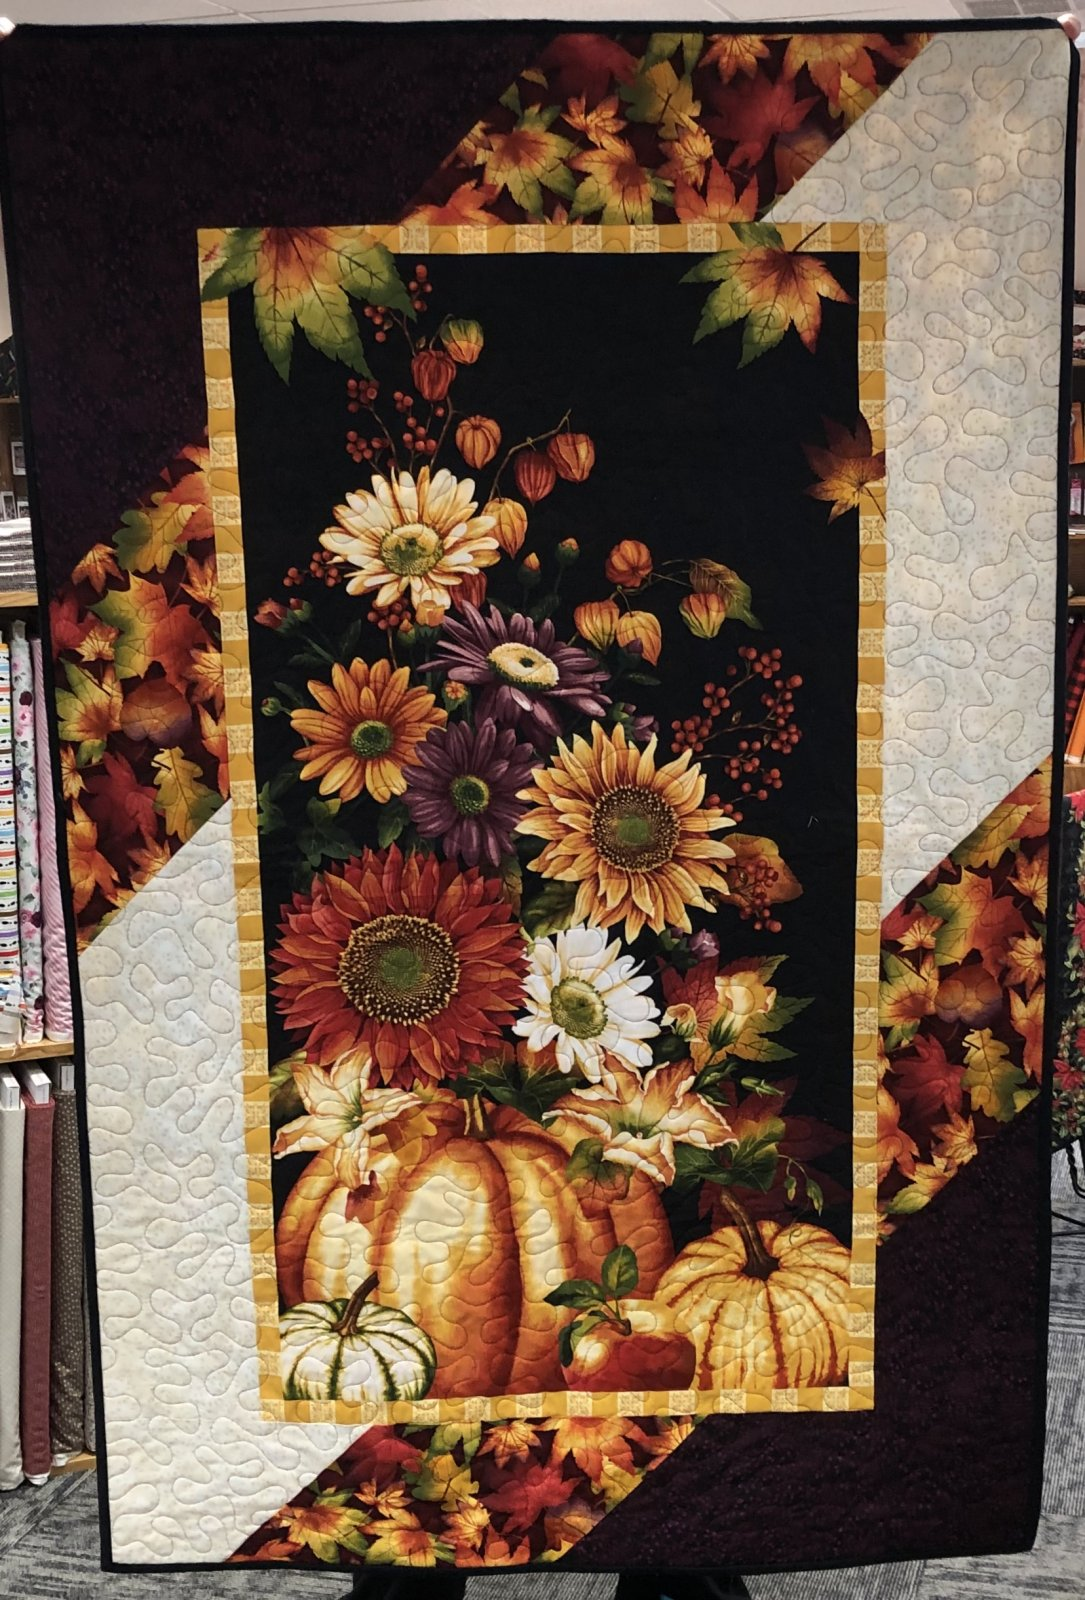 Autumn Time / Diva 34 X 53